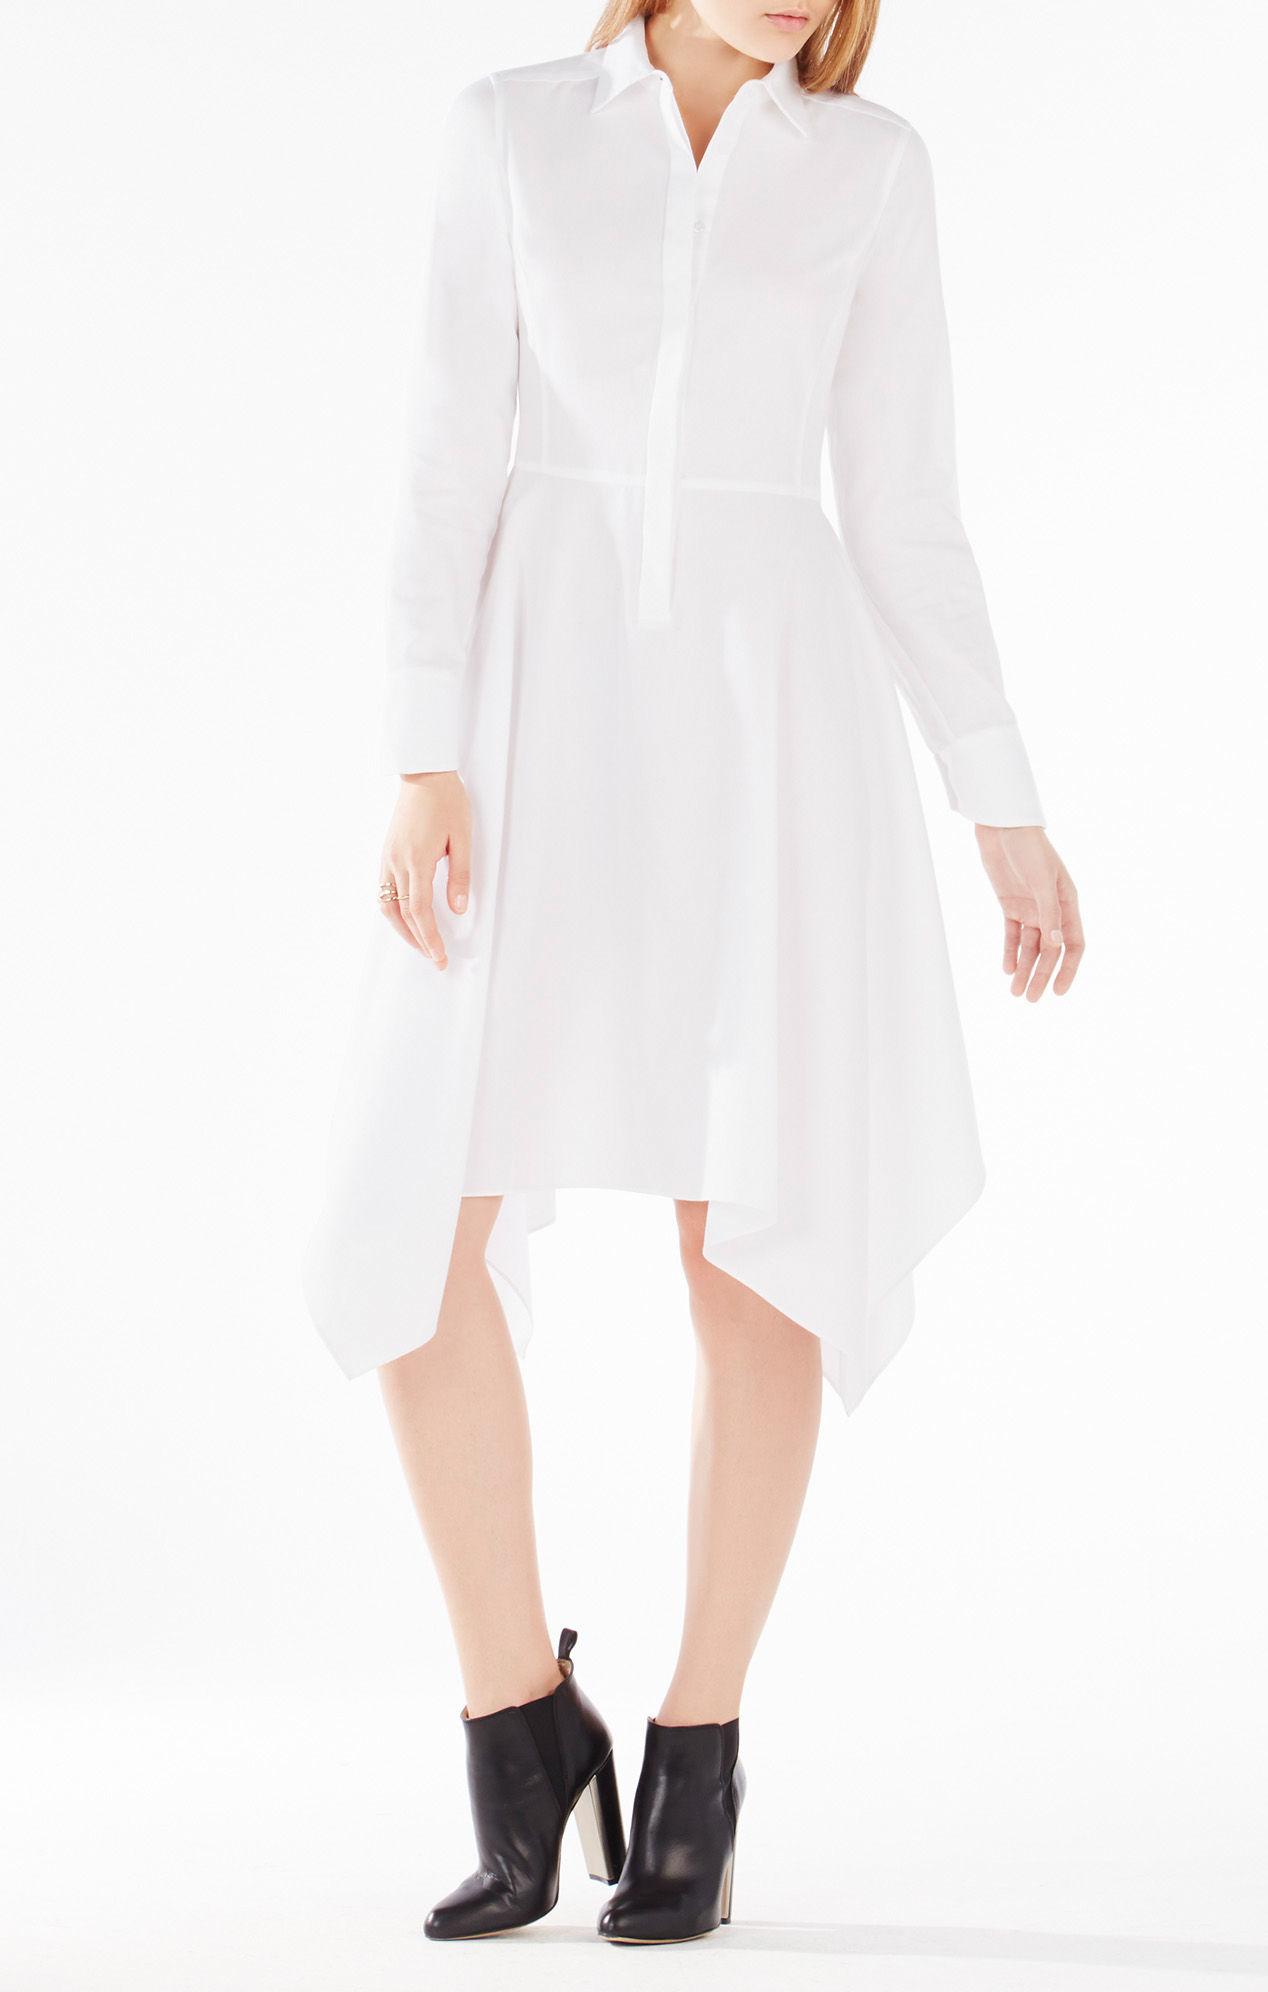 99d590828532 Lyst - BCBGMAXAZRIA Beatryce Handkerchief-hem Shirt Dress in White